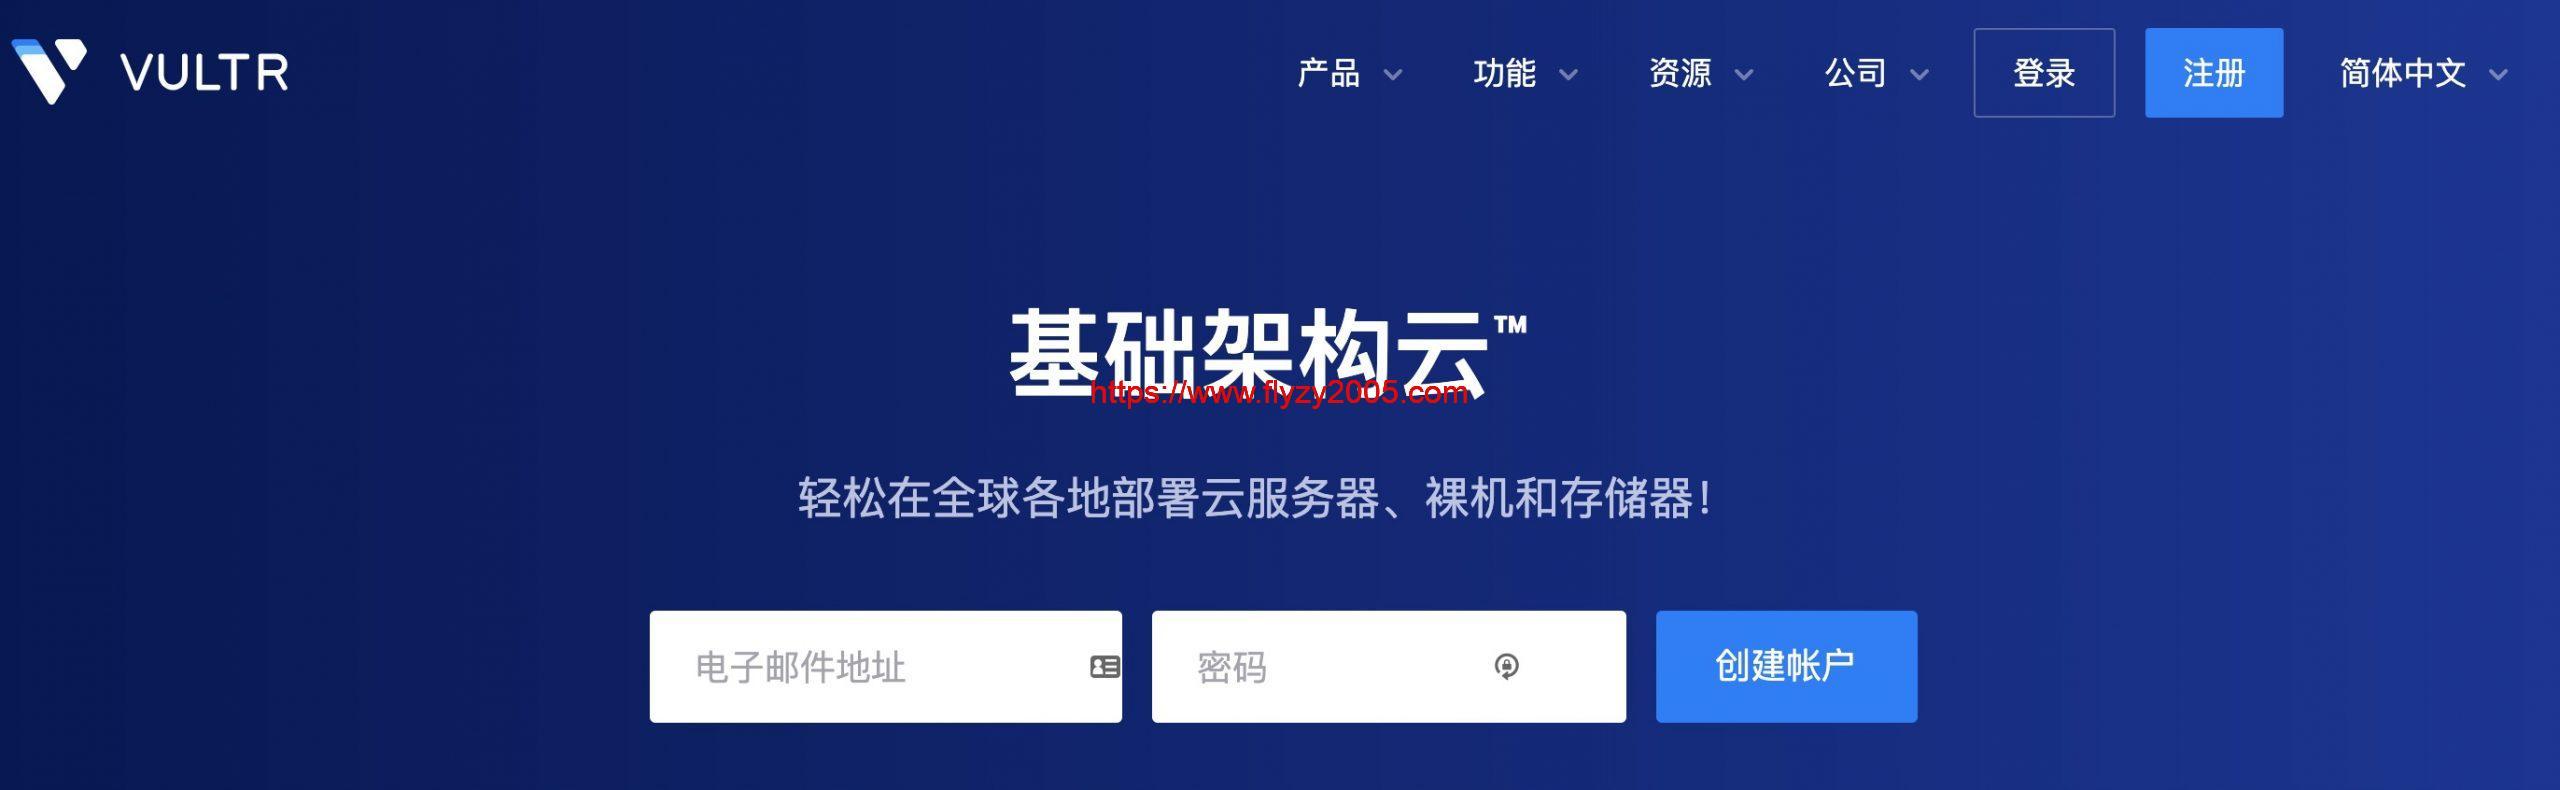 Vultr官网中文版